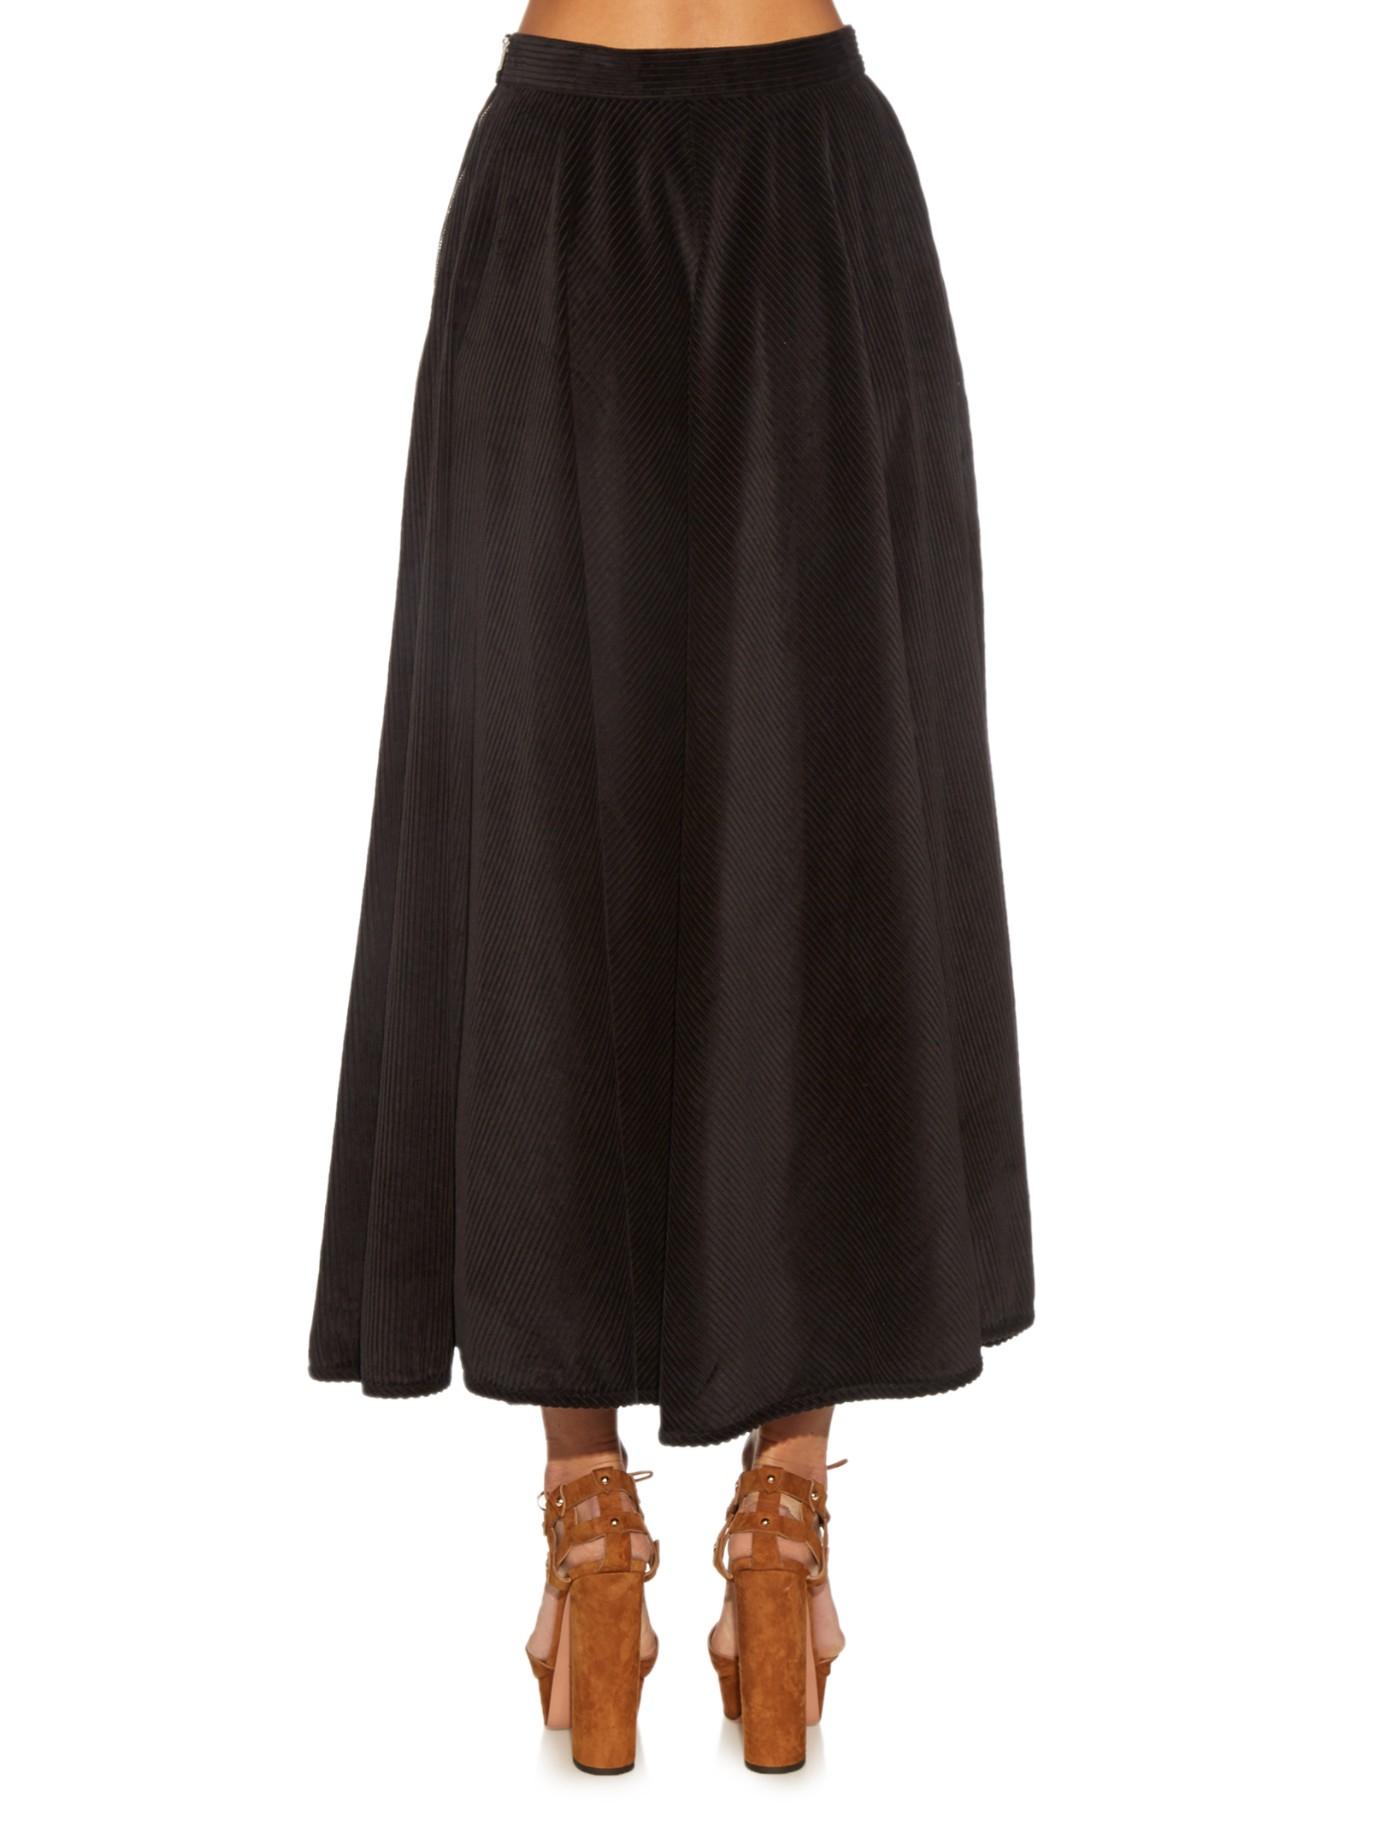 comey circle wide wale corduroy midi skirt in black